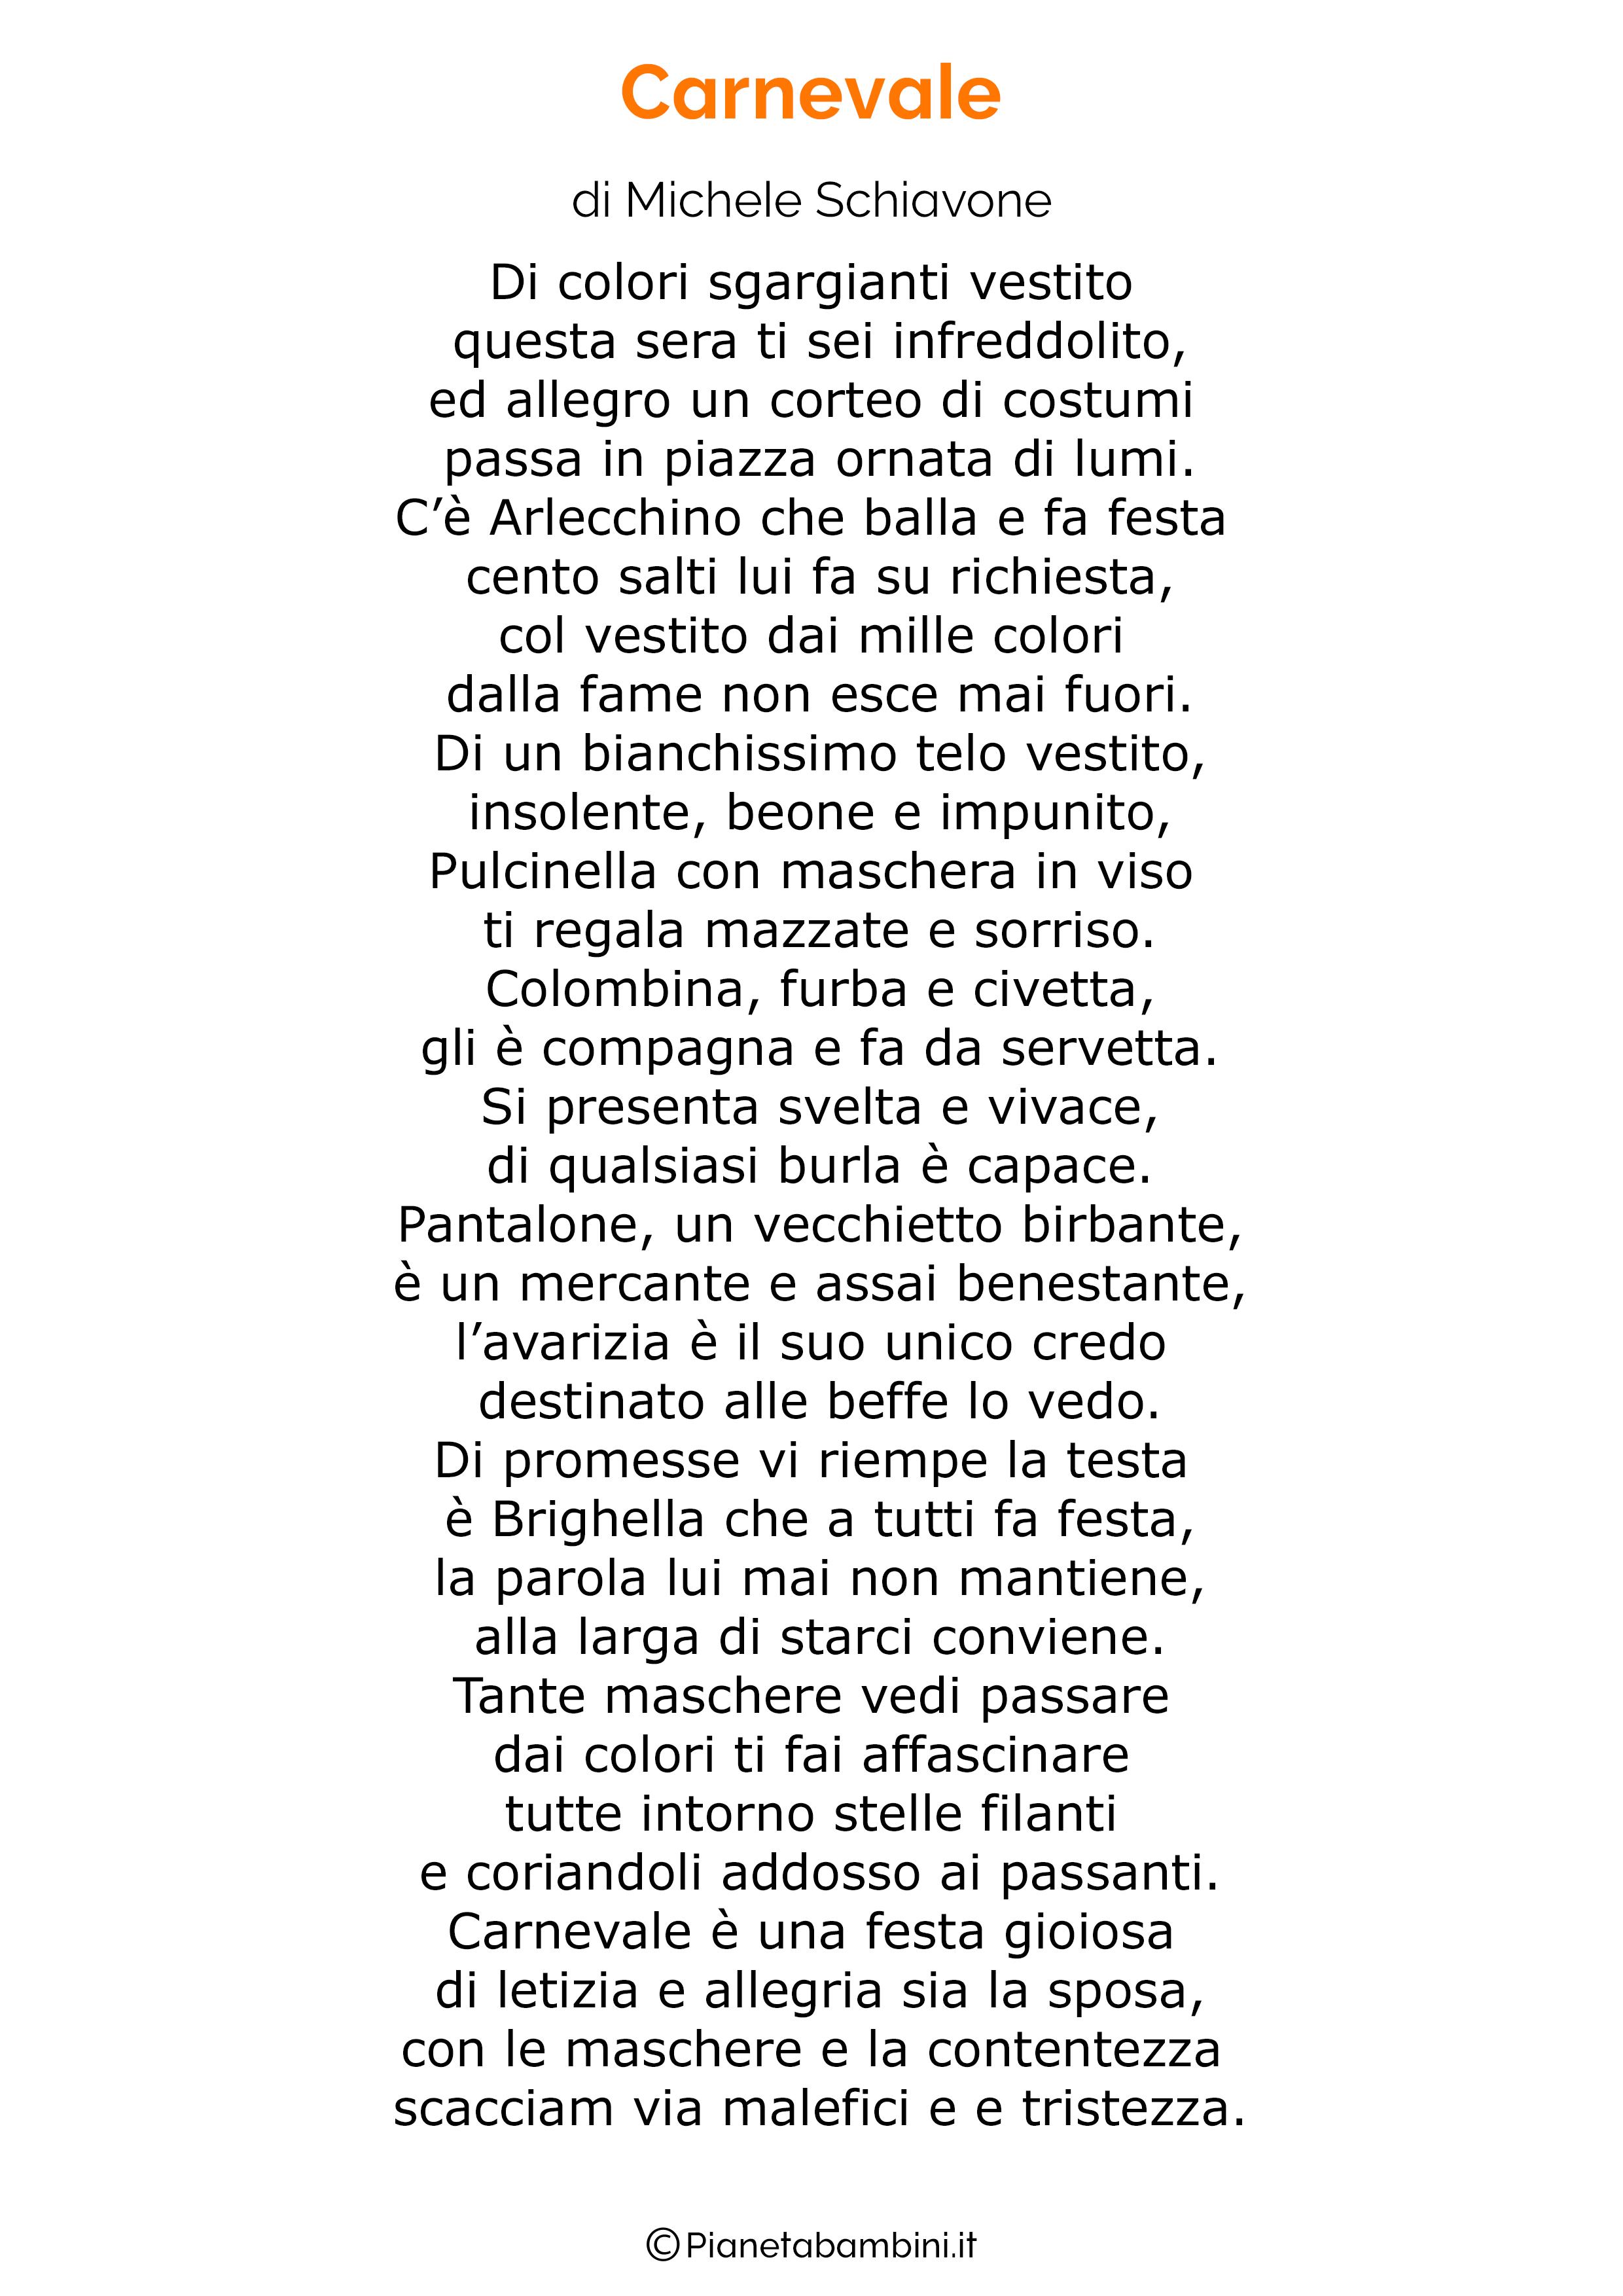 Poesie di Carnevale per bambini 15